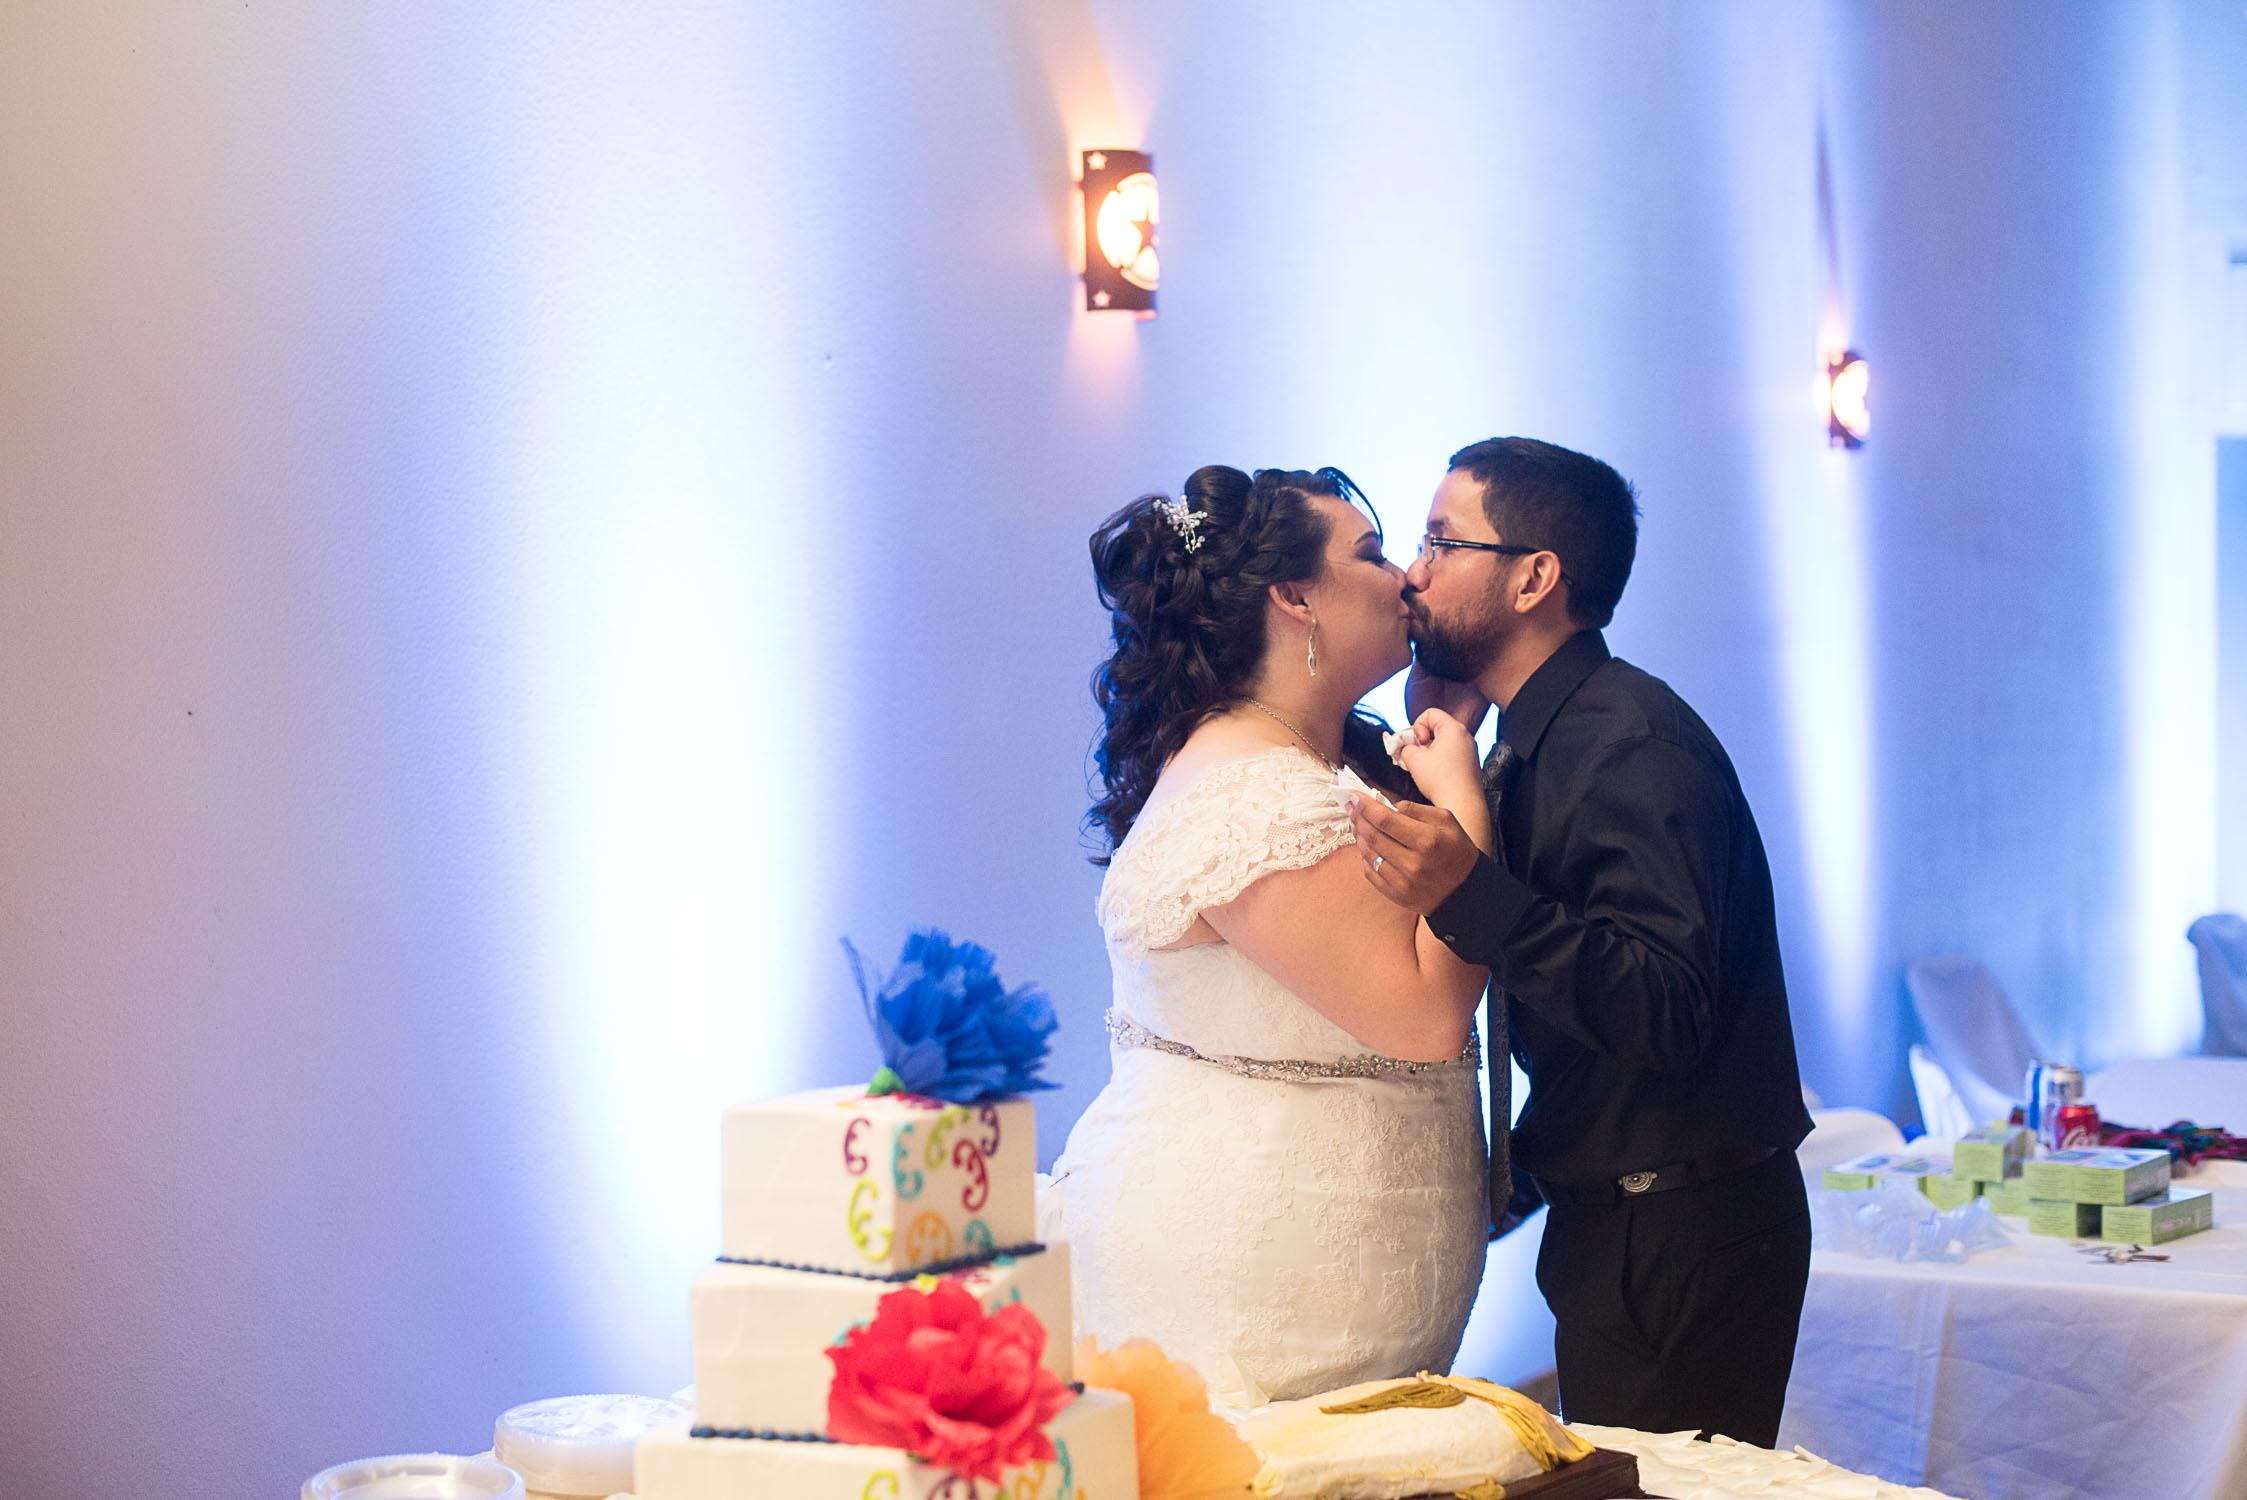 Leal Wedding Mira Visu Photography-189.jpg